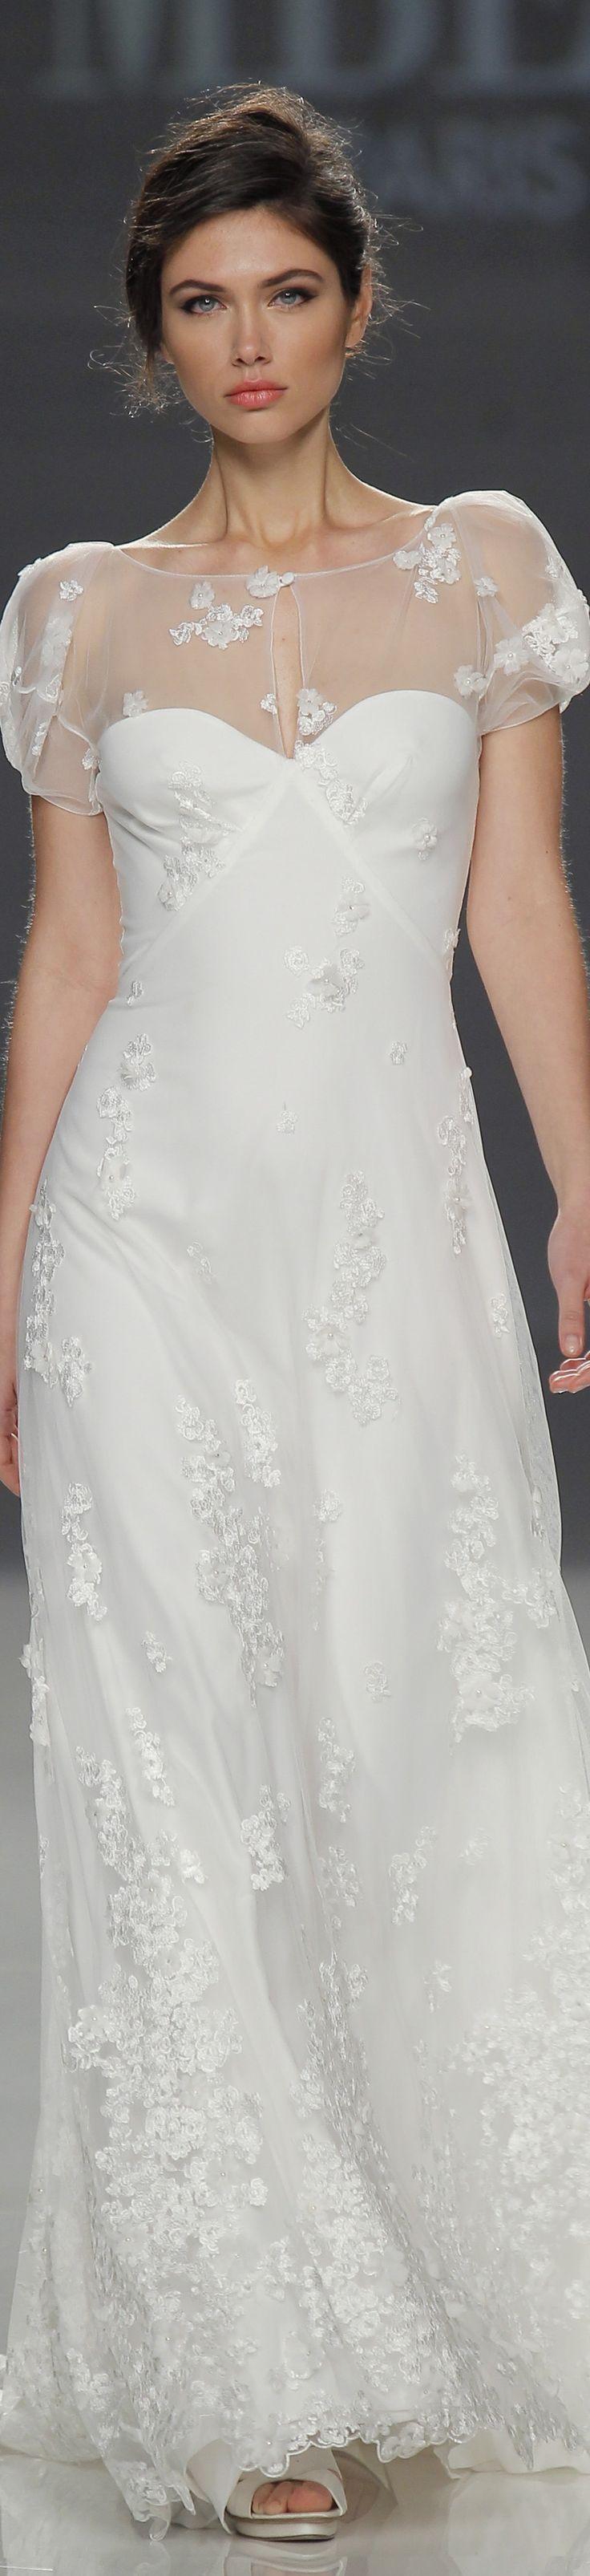 Cymbeline Spring 2018 Barcelona Bridal Fashion Week Wedding Dress Inspiration Bridal Dresses Modern Wedding Dress [ 3211 x 736 Pixel ]